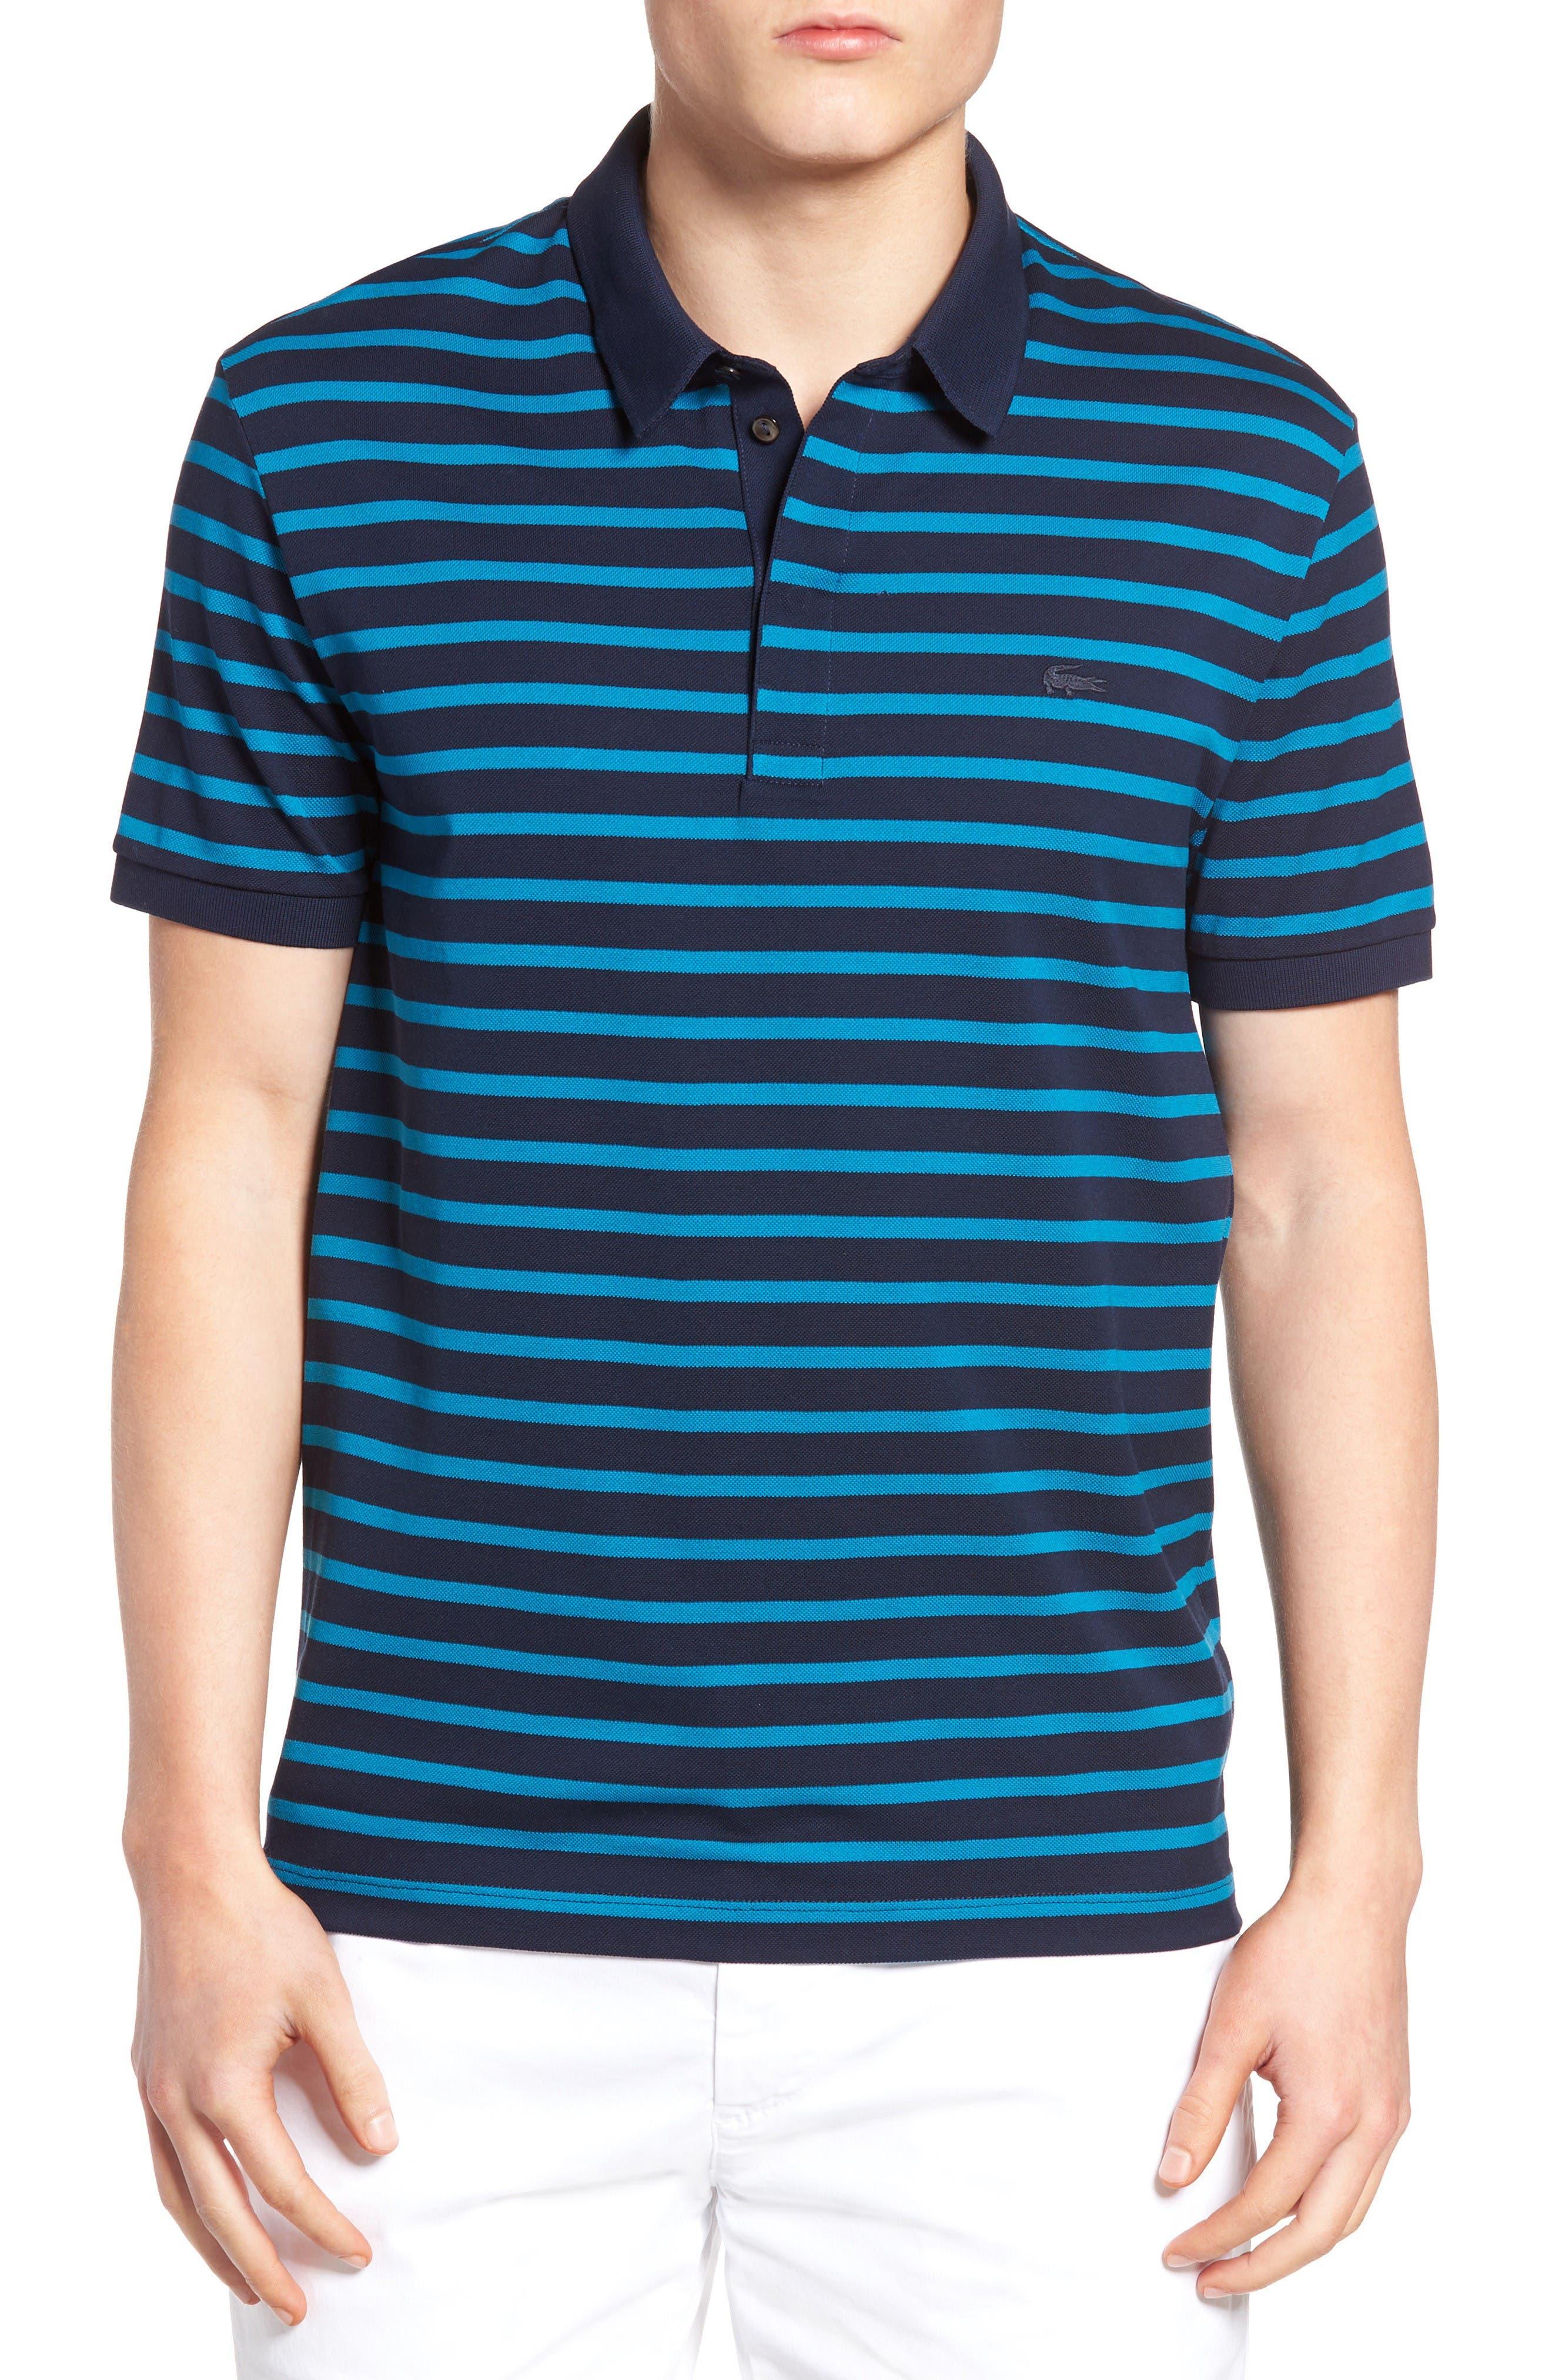 Lacoste Slim Fit Striped Polo